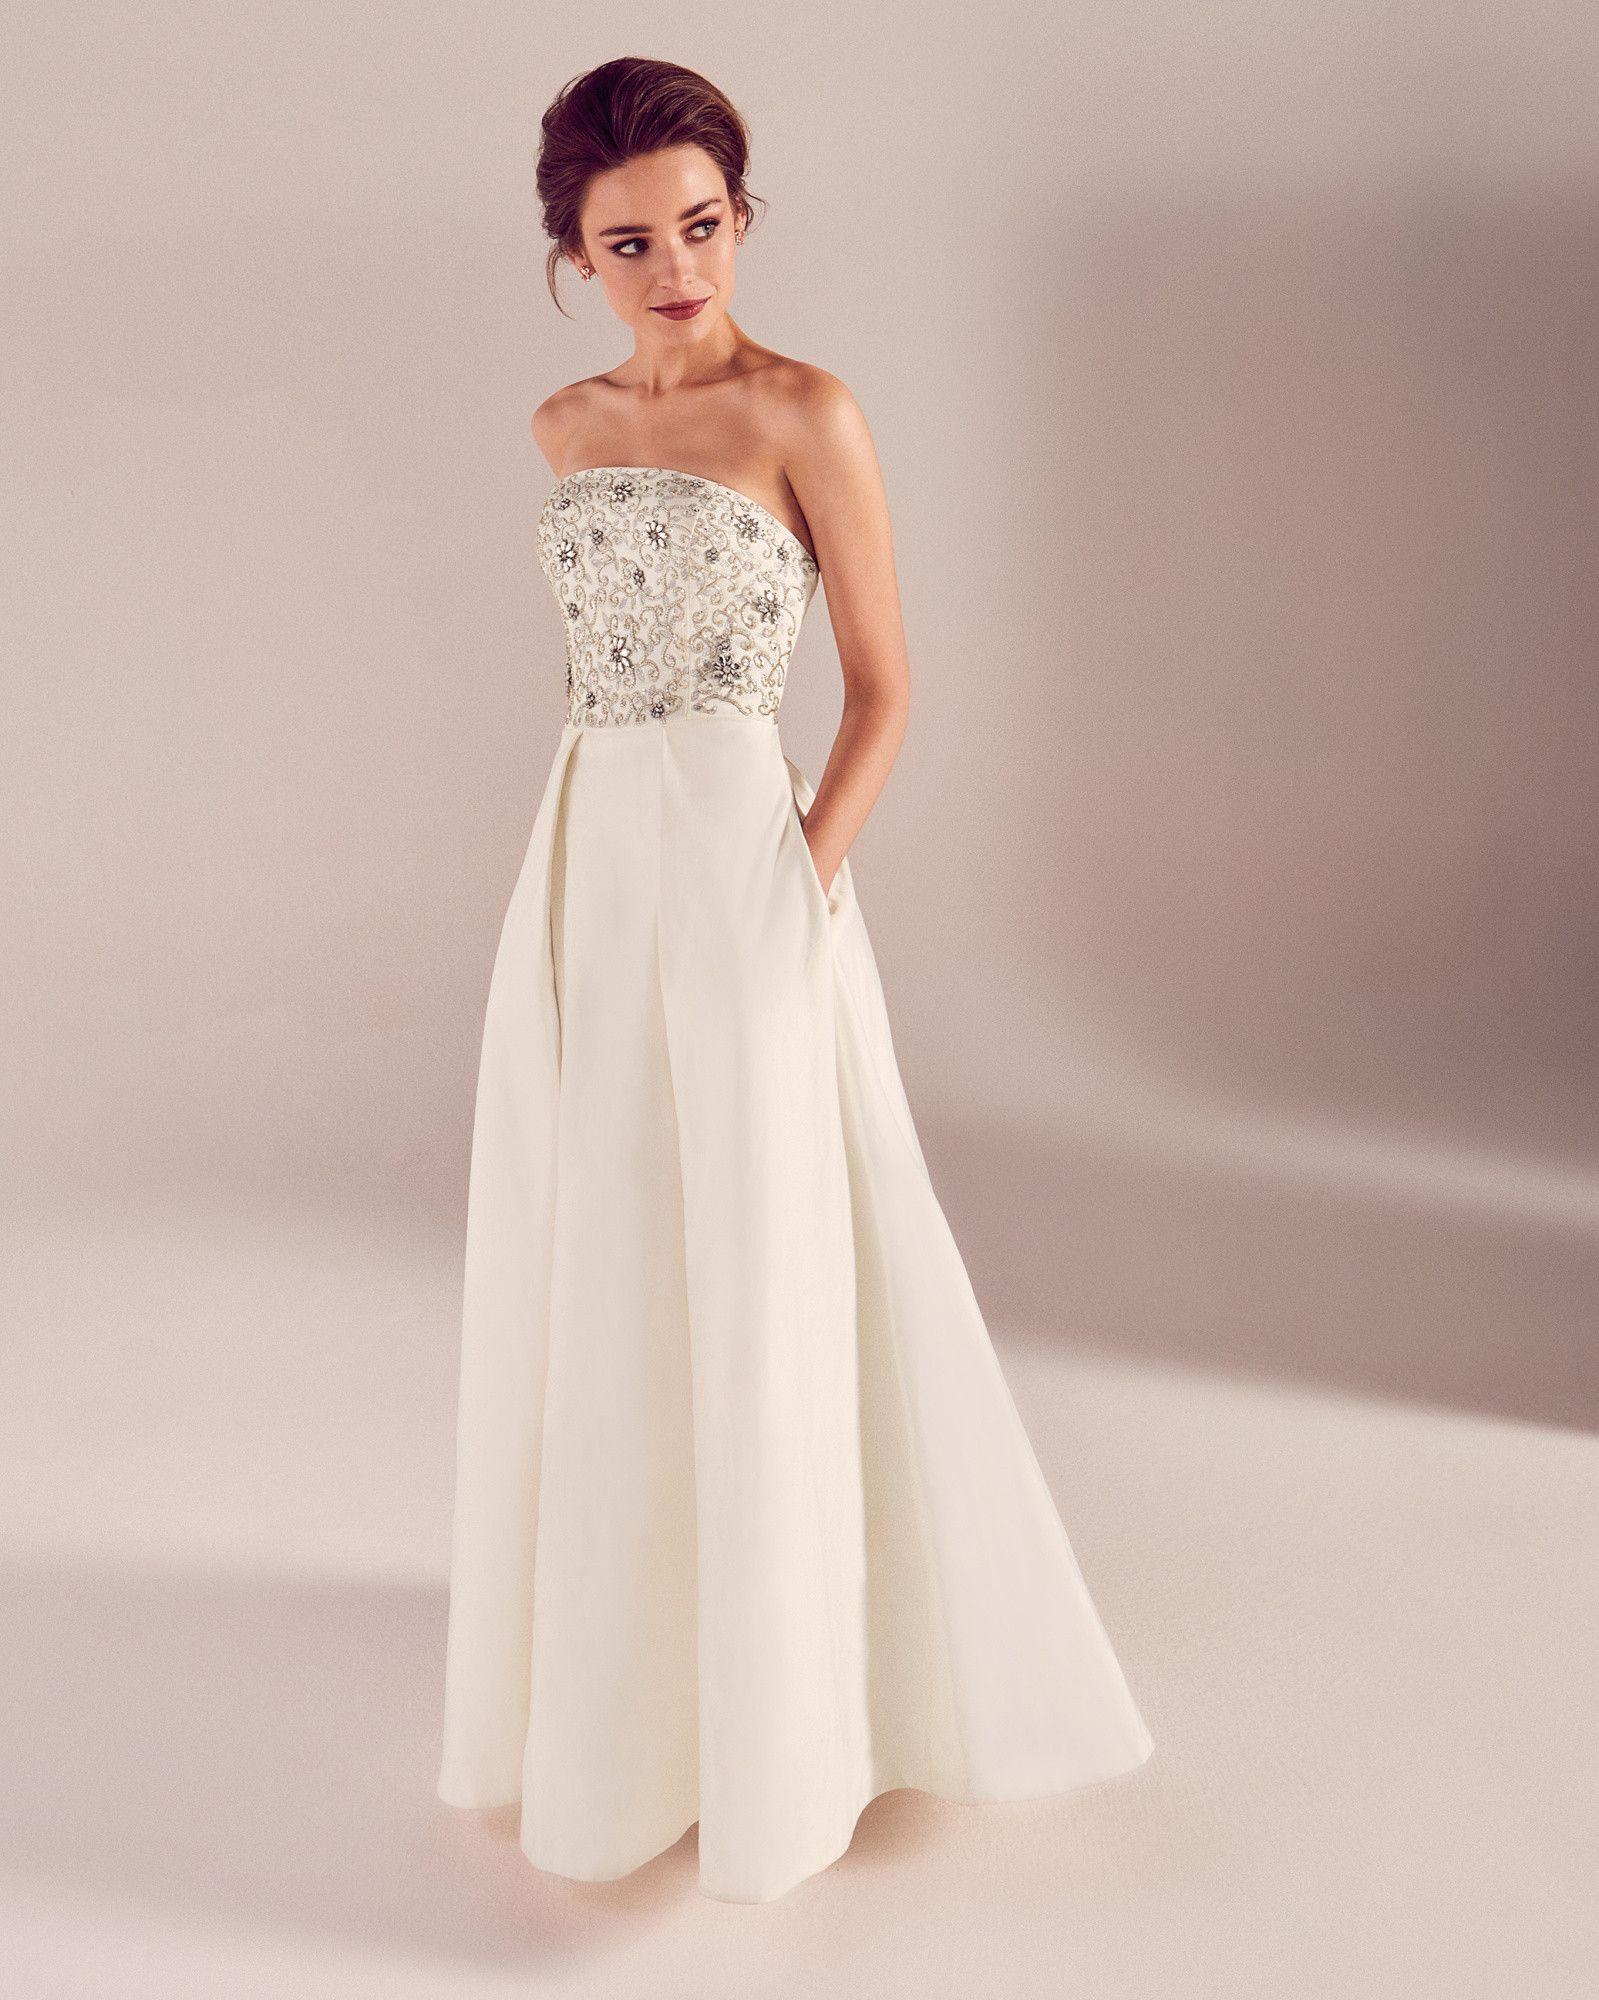 Embellished Bodice Bridal Dress White Ss17 Tie The Knot Ted Baker Uk Tedbaker Wedwithted Designer Outfits Woman Dresses Embellished Wedding Dress